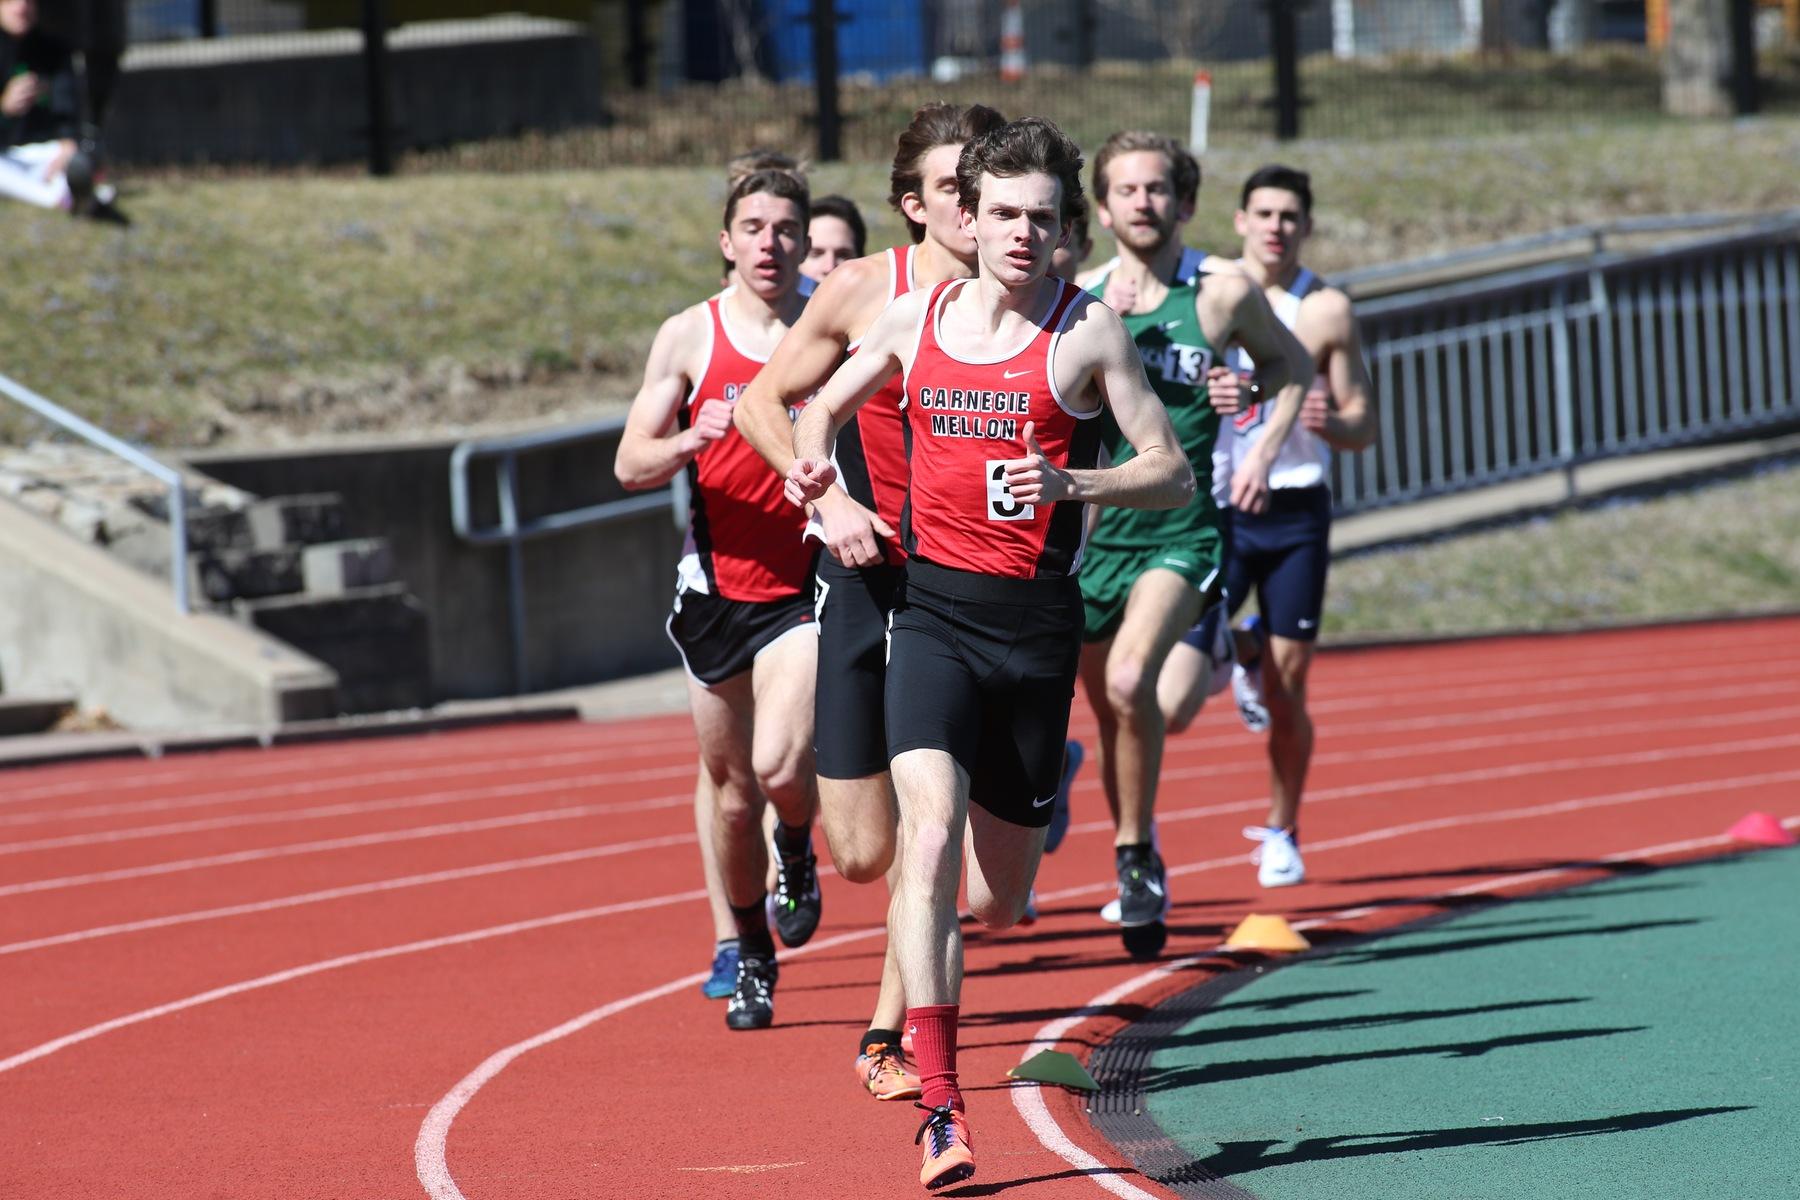 Sports Photography At Cmu: Carnegie Mellon Invitational